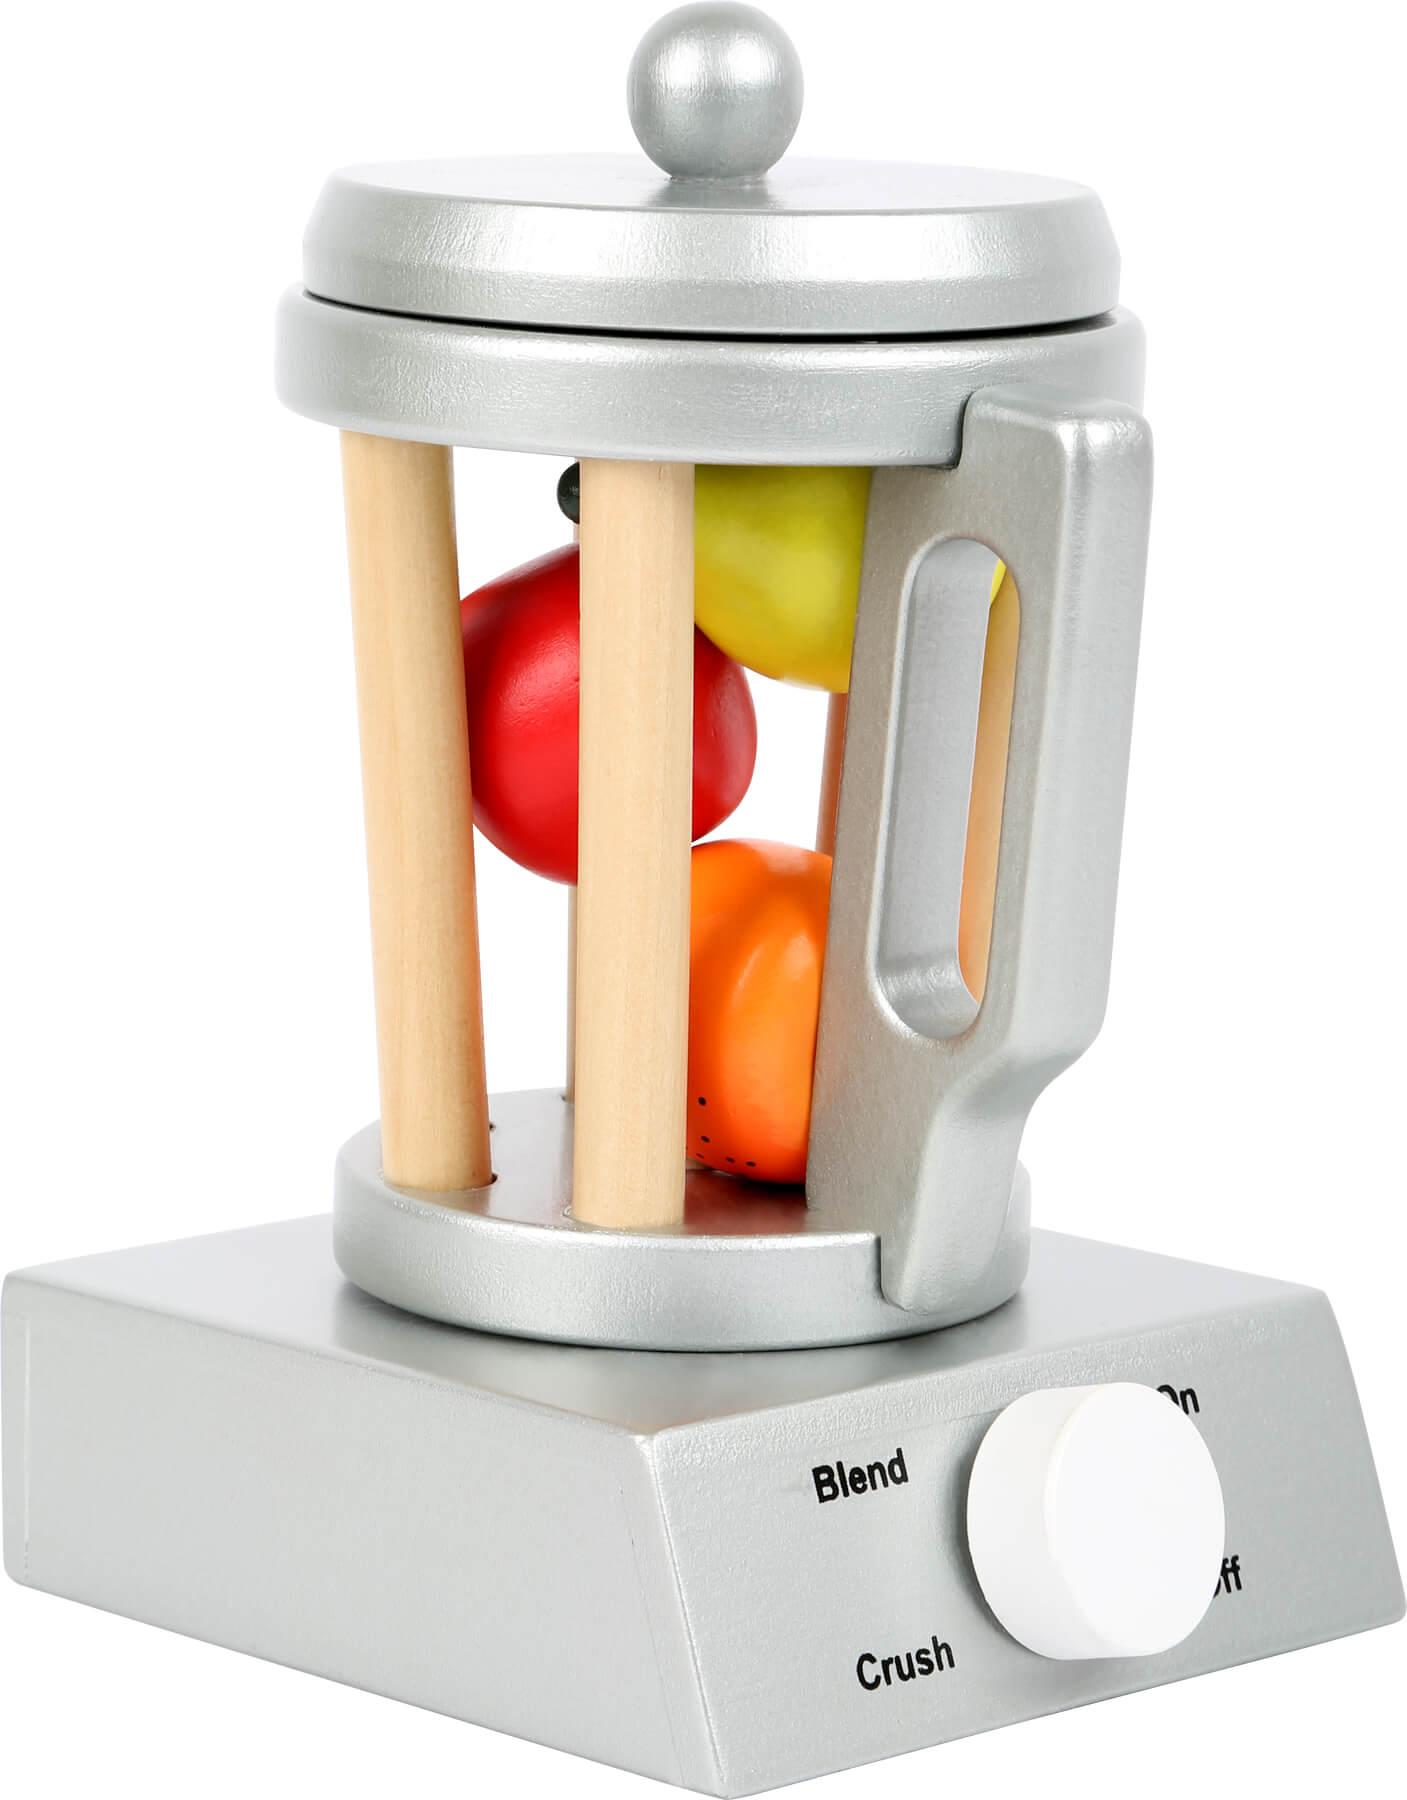 Frullatore cucina per bimbi